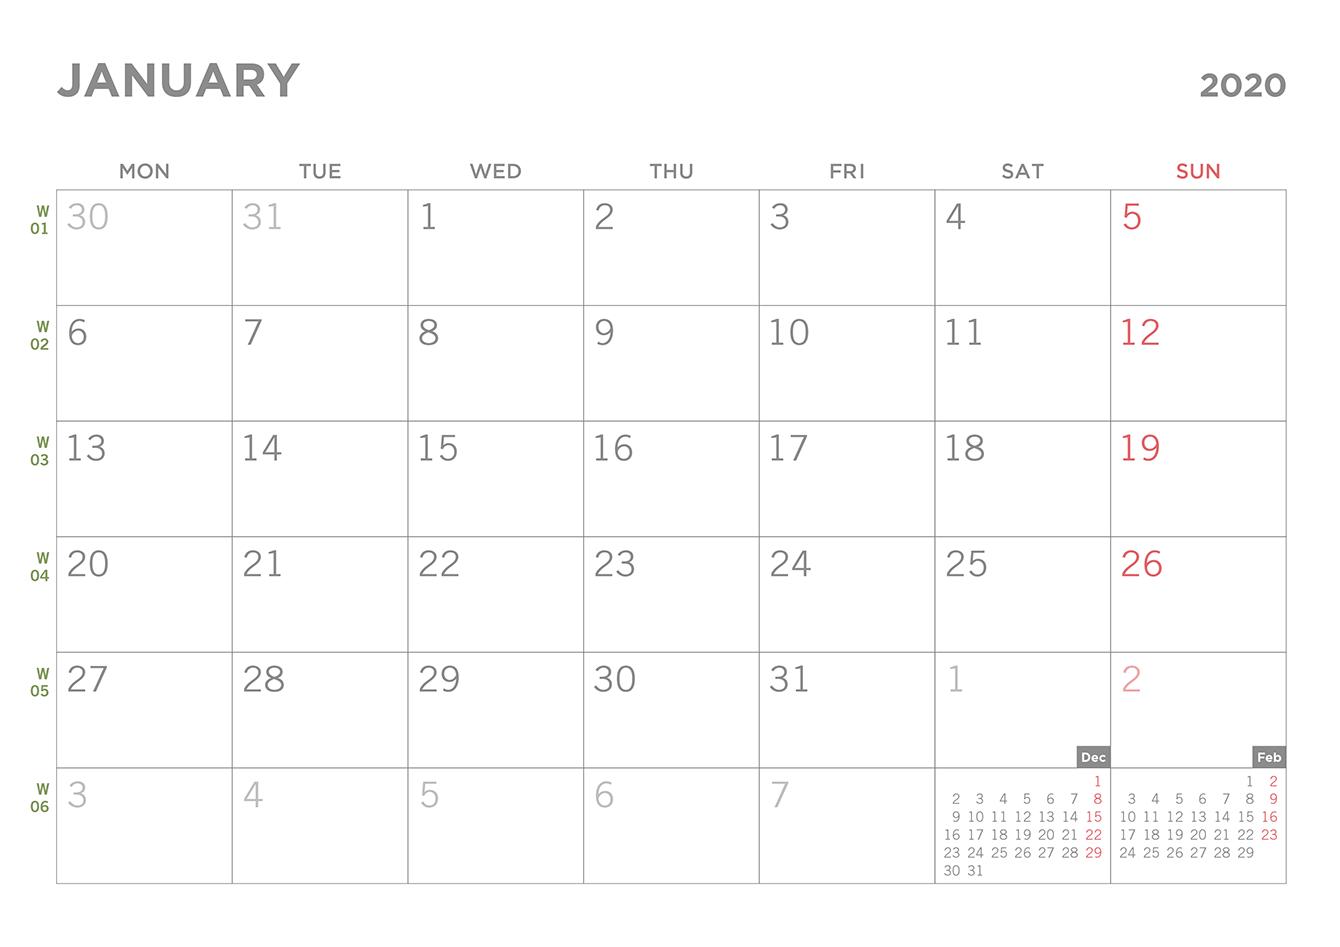 Calendar Template For Mac - Wpa.wpart.co